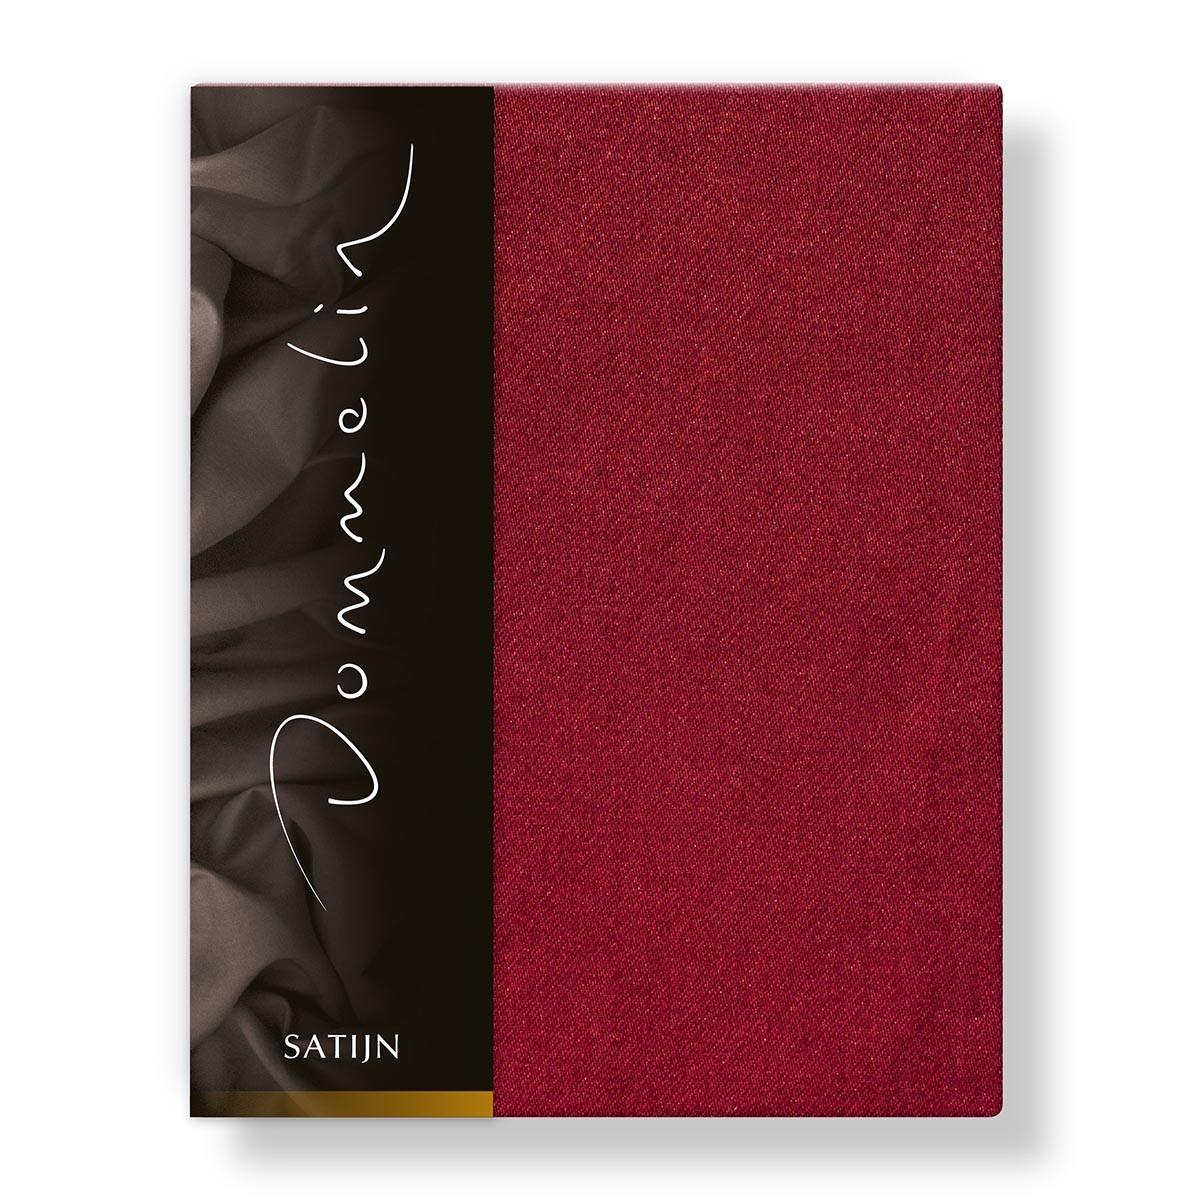 dommelin laken deluxe satijn rosso 200 x 270 cm. Black Bedroom Furniture Sets. Home Design Ideas